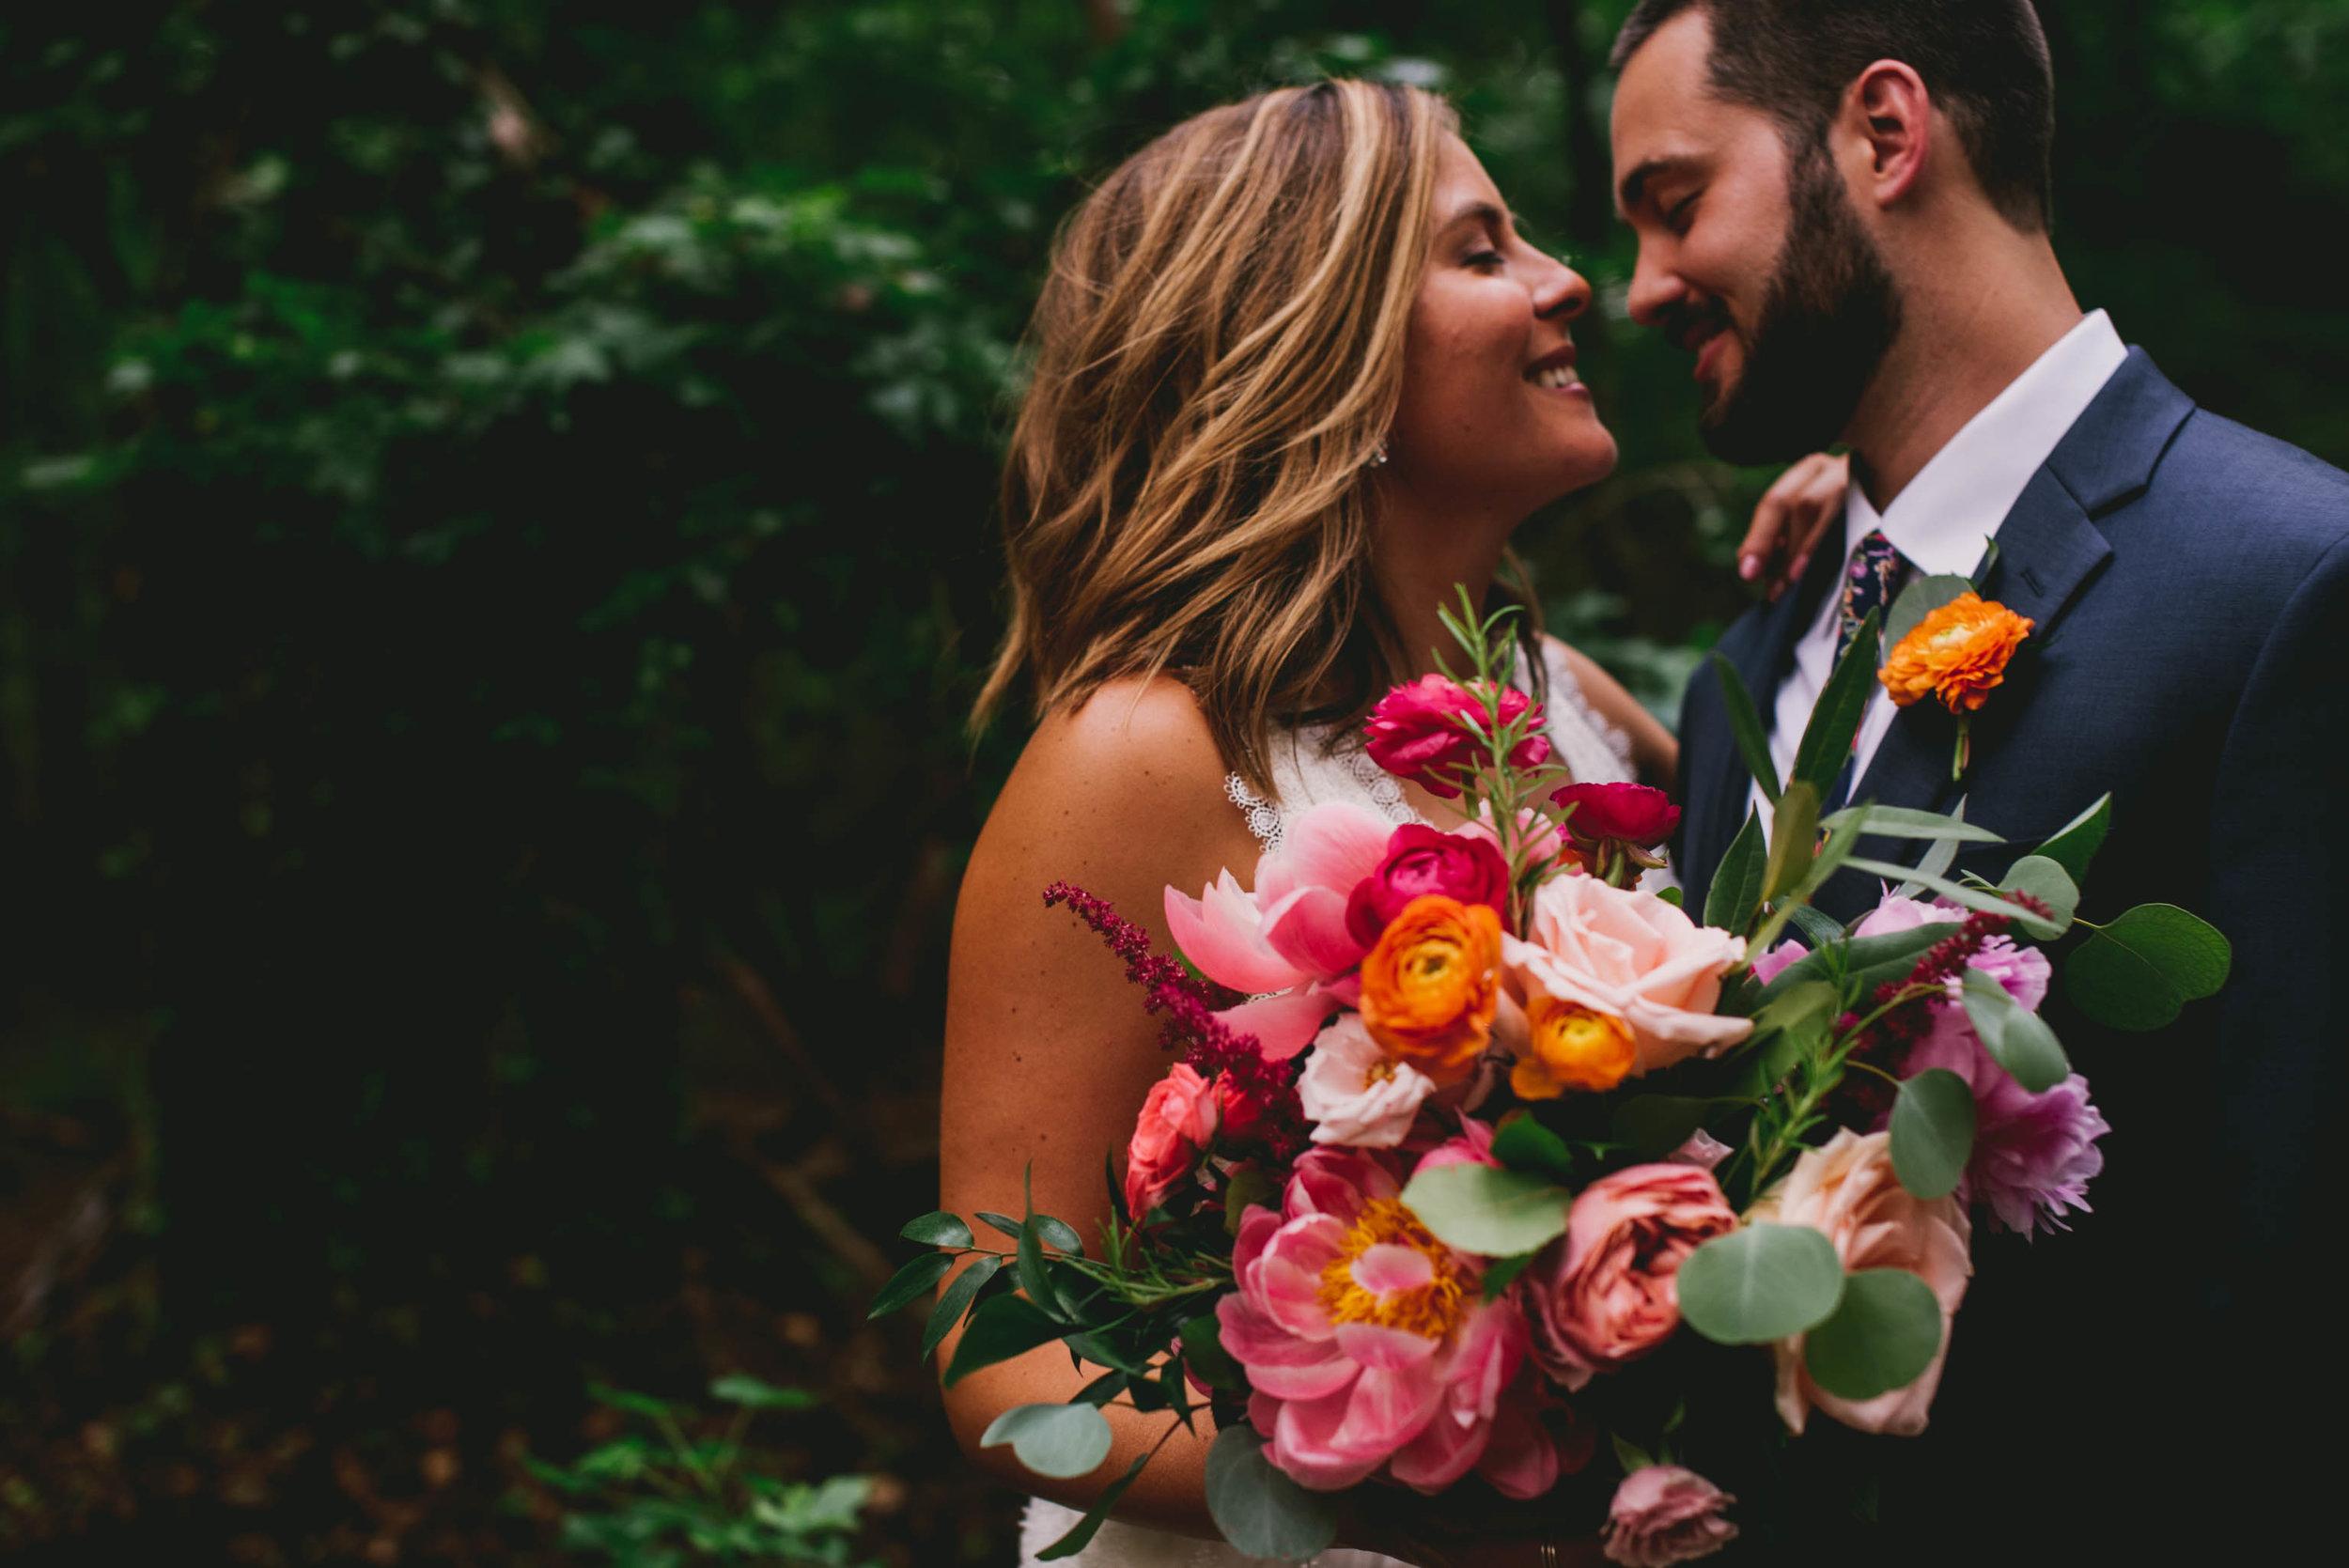 mims-house-wedding-bride-and-groom-photograph.jpg